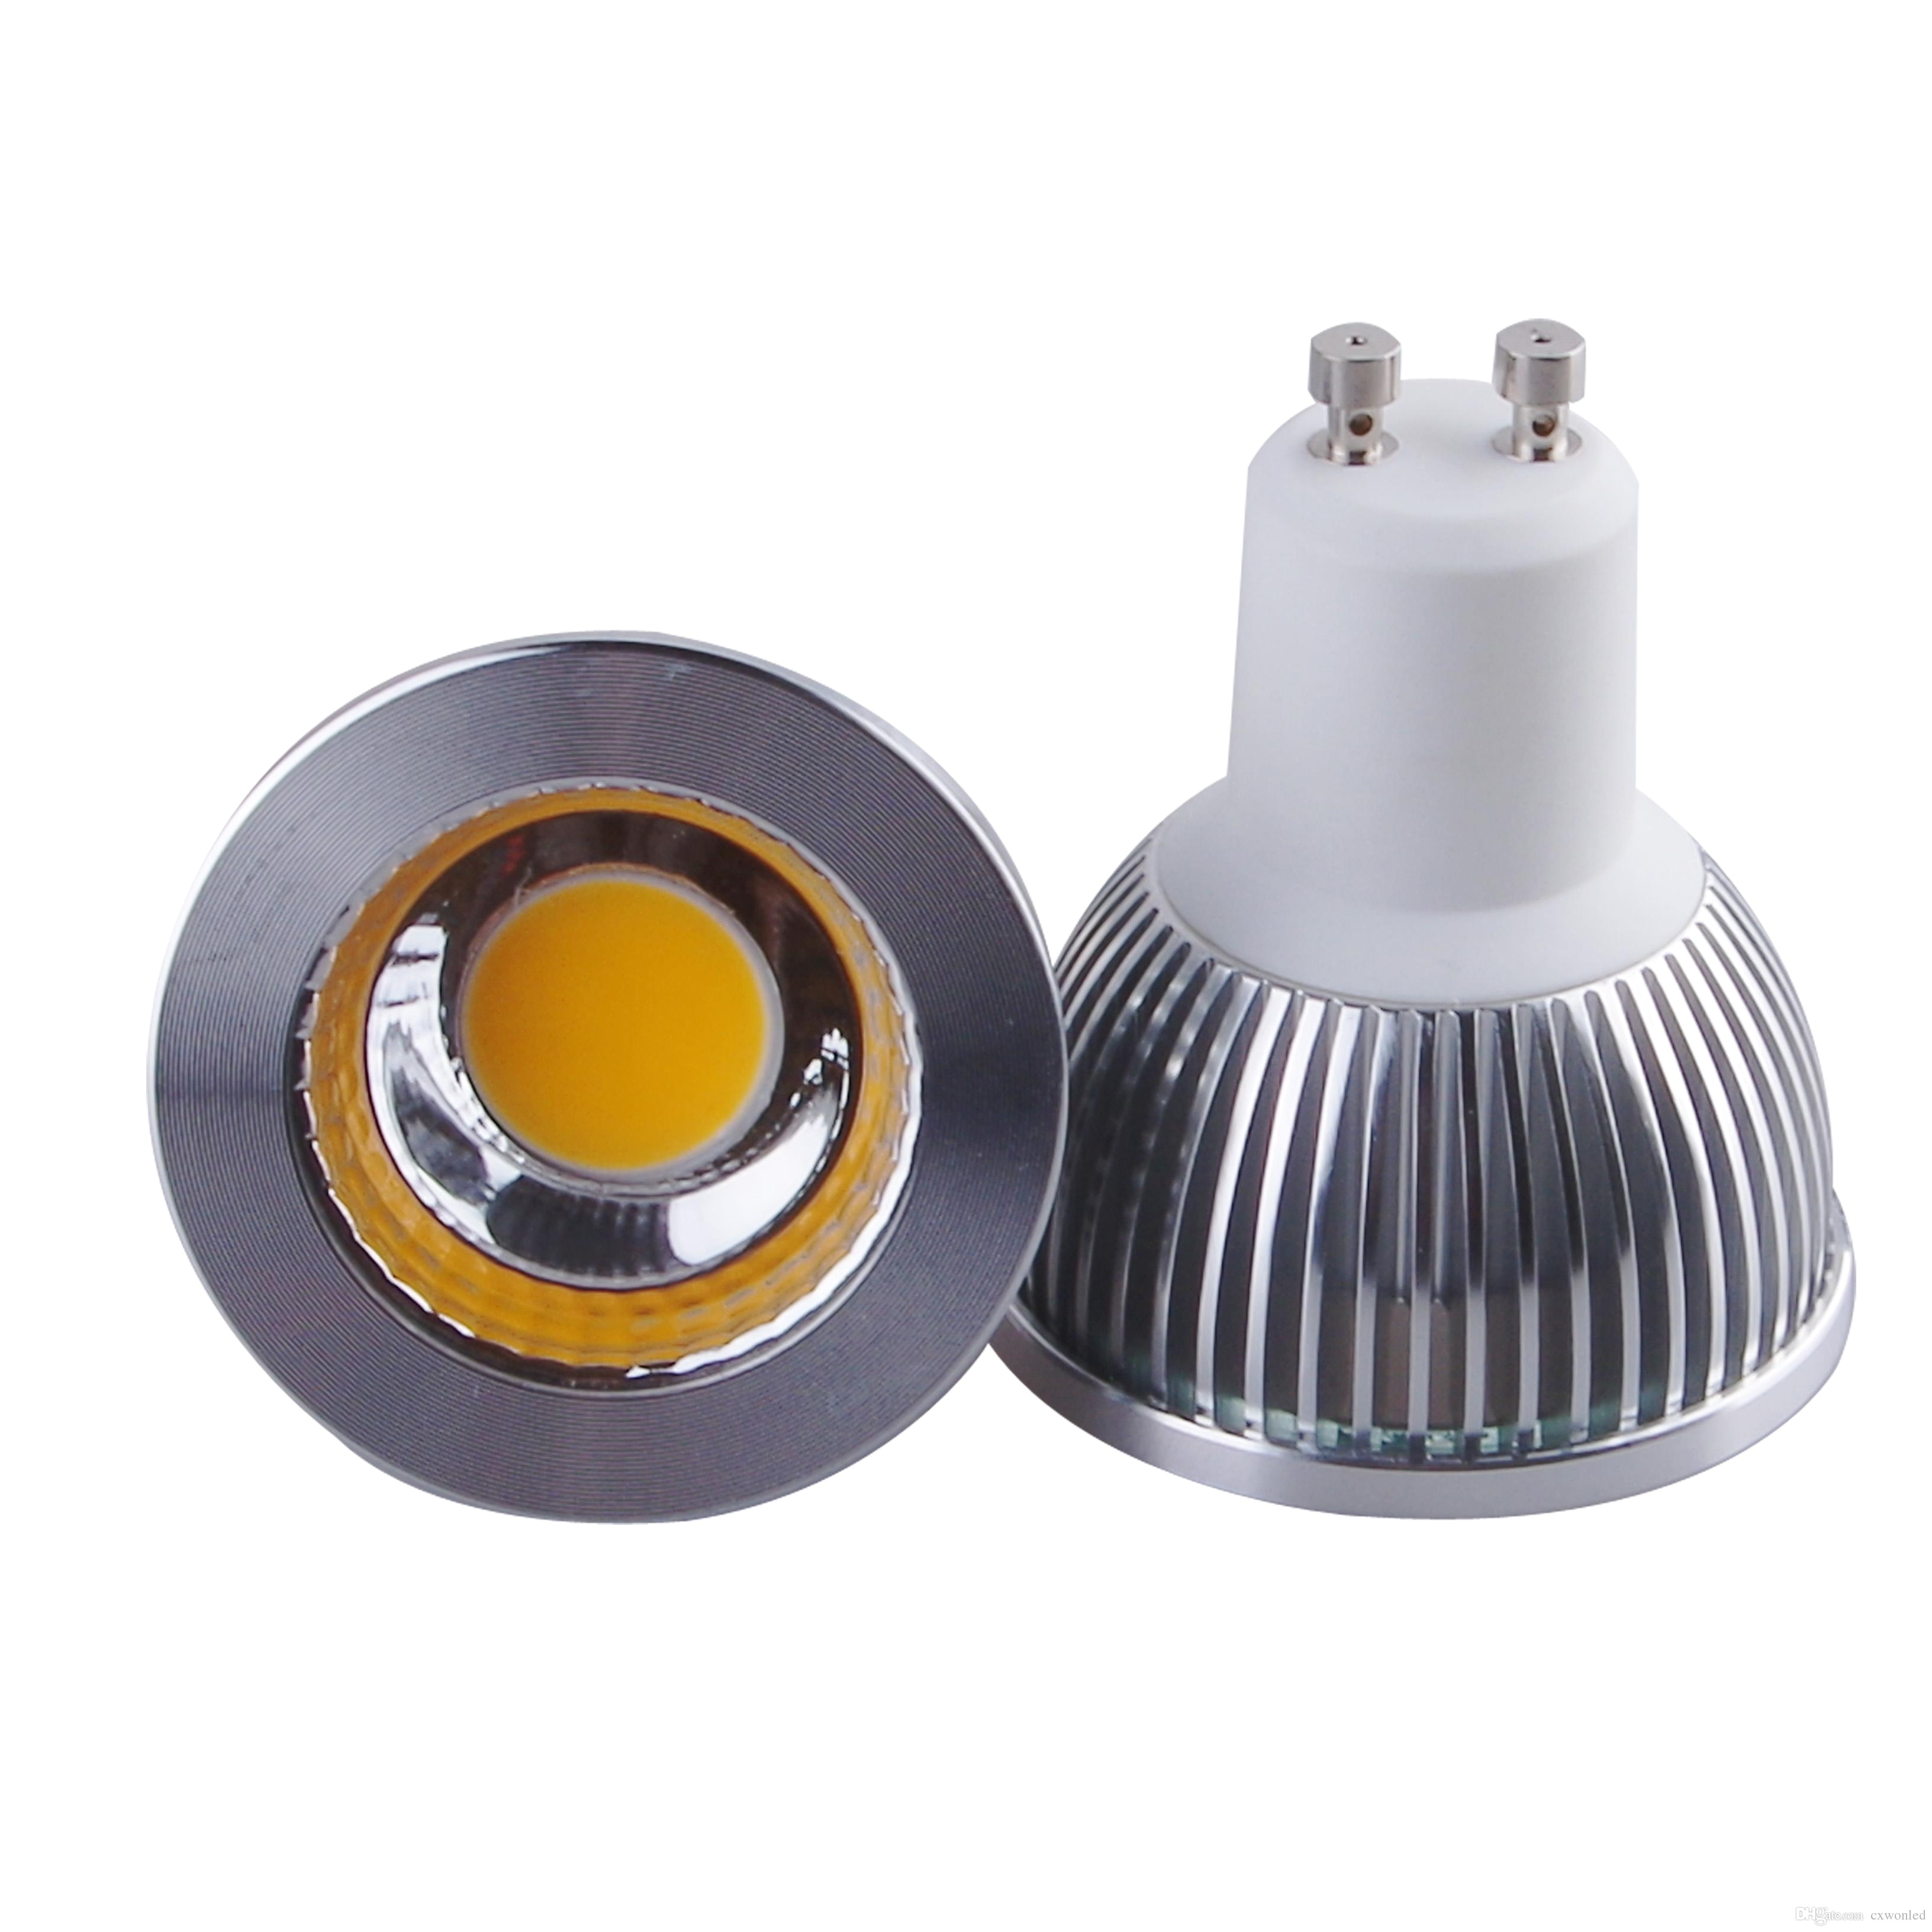 dimmable gu10 mr16 e27 gu5 3 cob led bulb light 5w led spot bulbs down lights lamp ac85 265v 12v dimmable spot light mr16 led spot light led spot bulbs